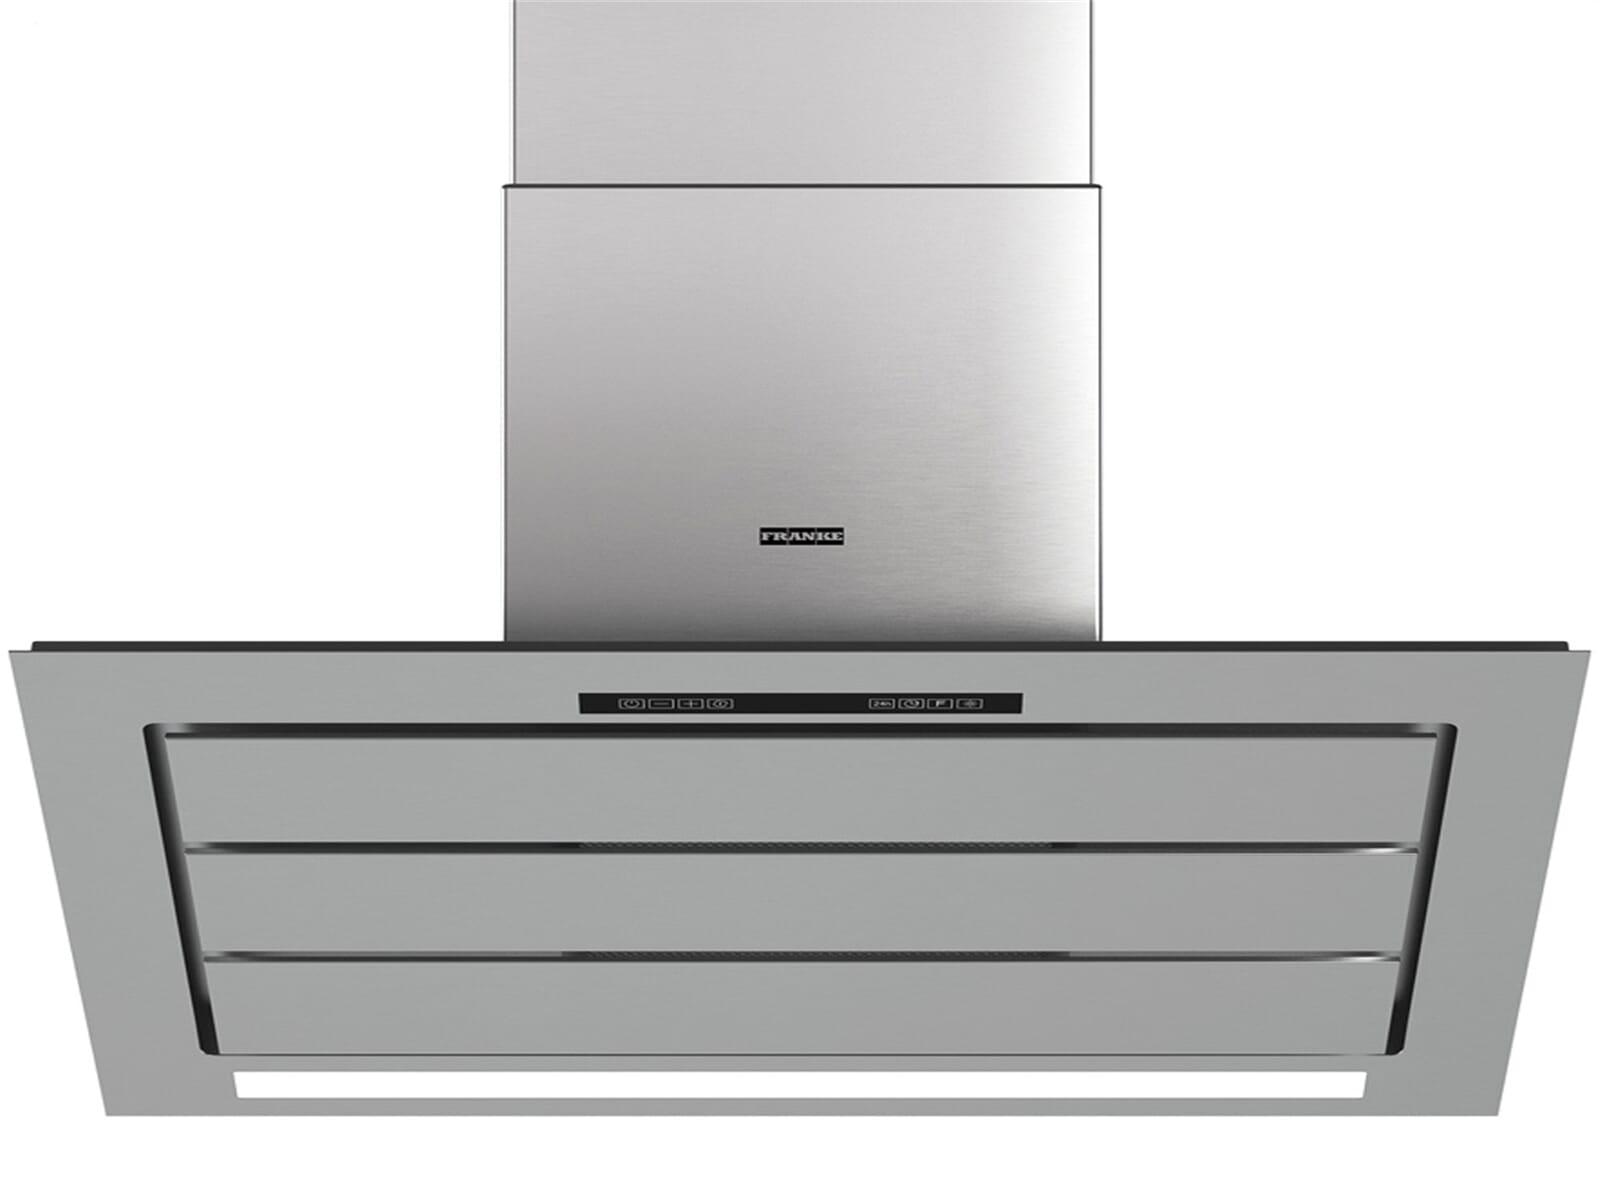 franke imagine sc fim 918 xg kopffreihaube wandesse dunstabzugshaube edelstahl ebay. Black Bedroom Furniture Sets. Home Design Ideas